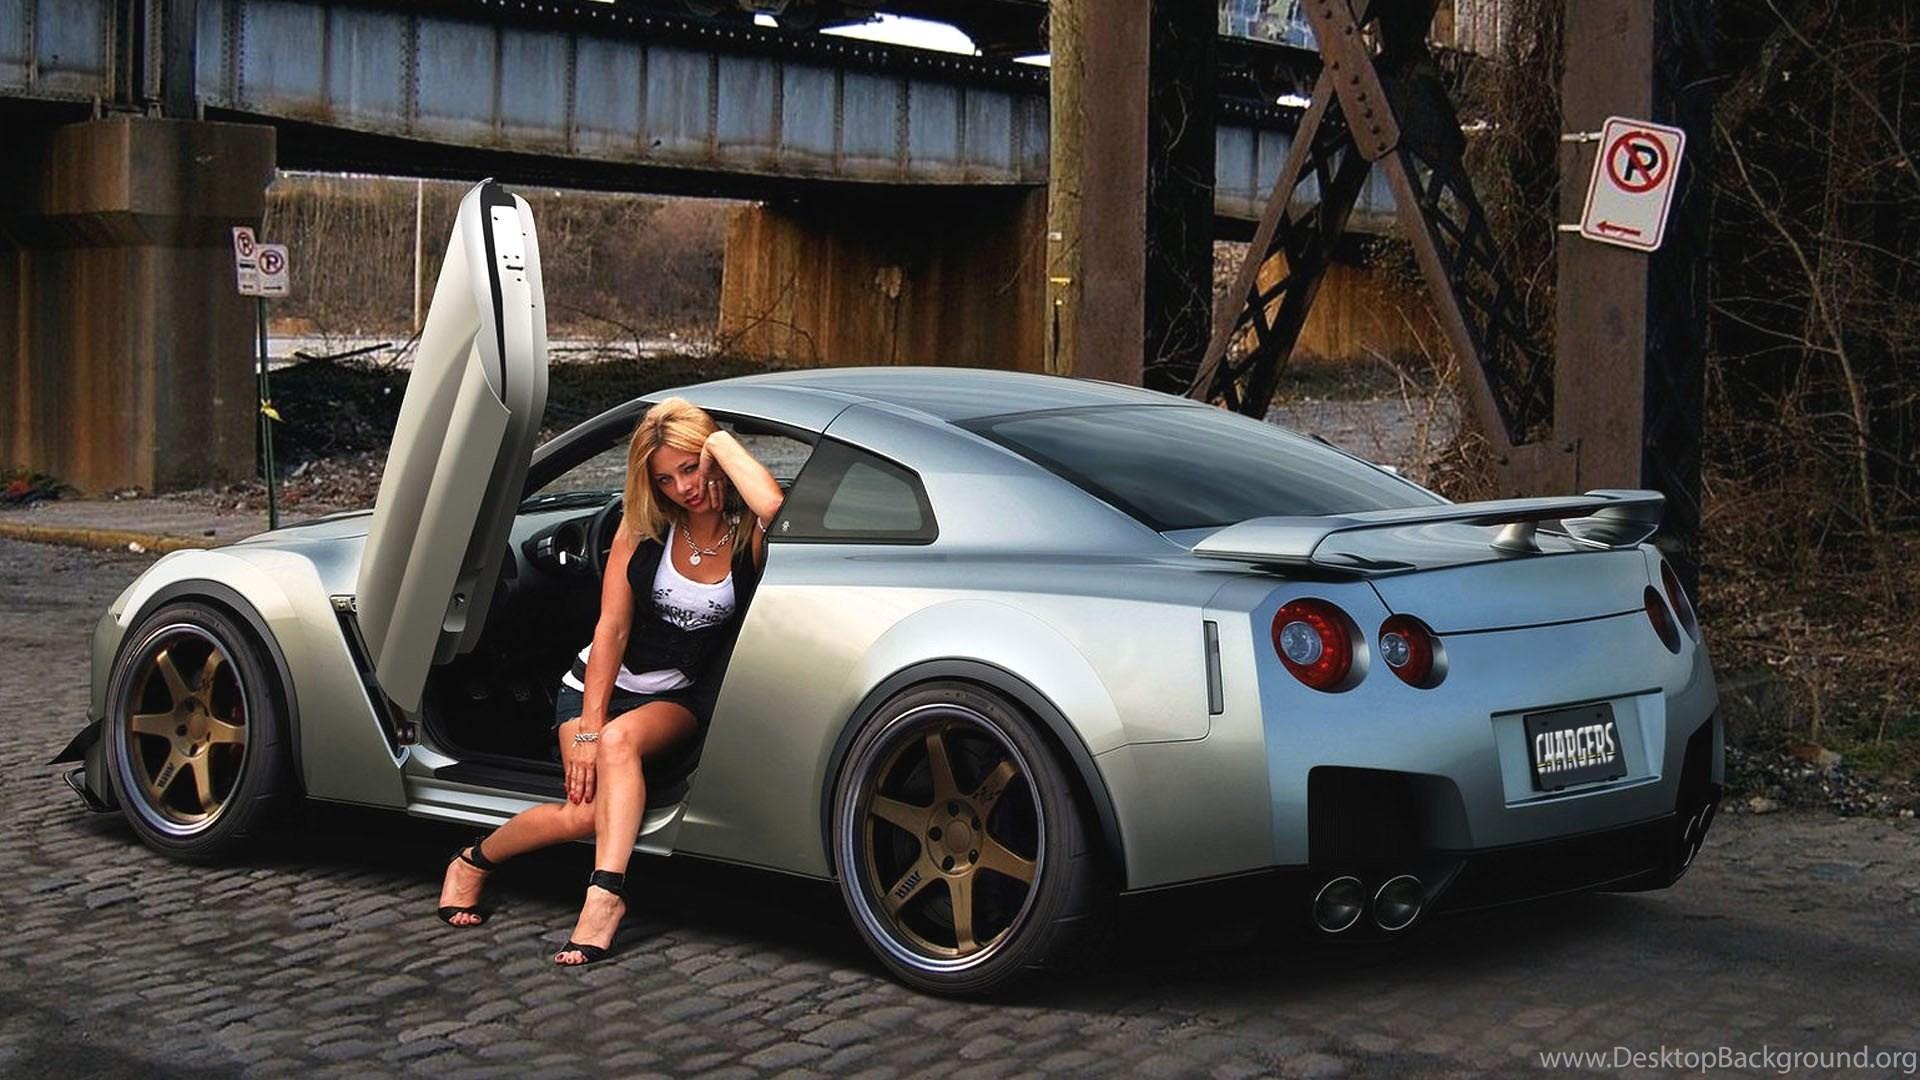 Women Cars Pinups Jdm Japanese Domestic Market Wallpapers Desktop Background